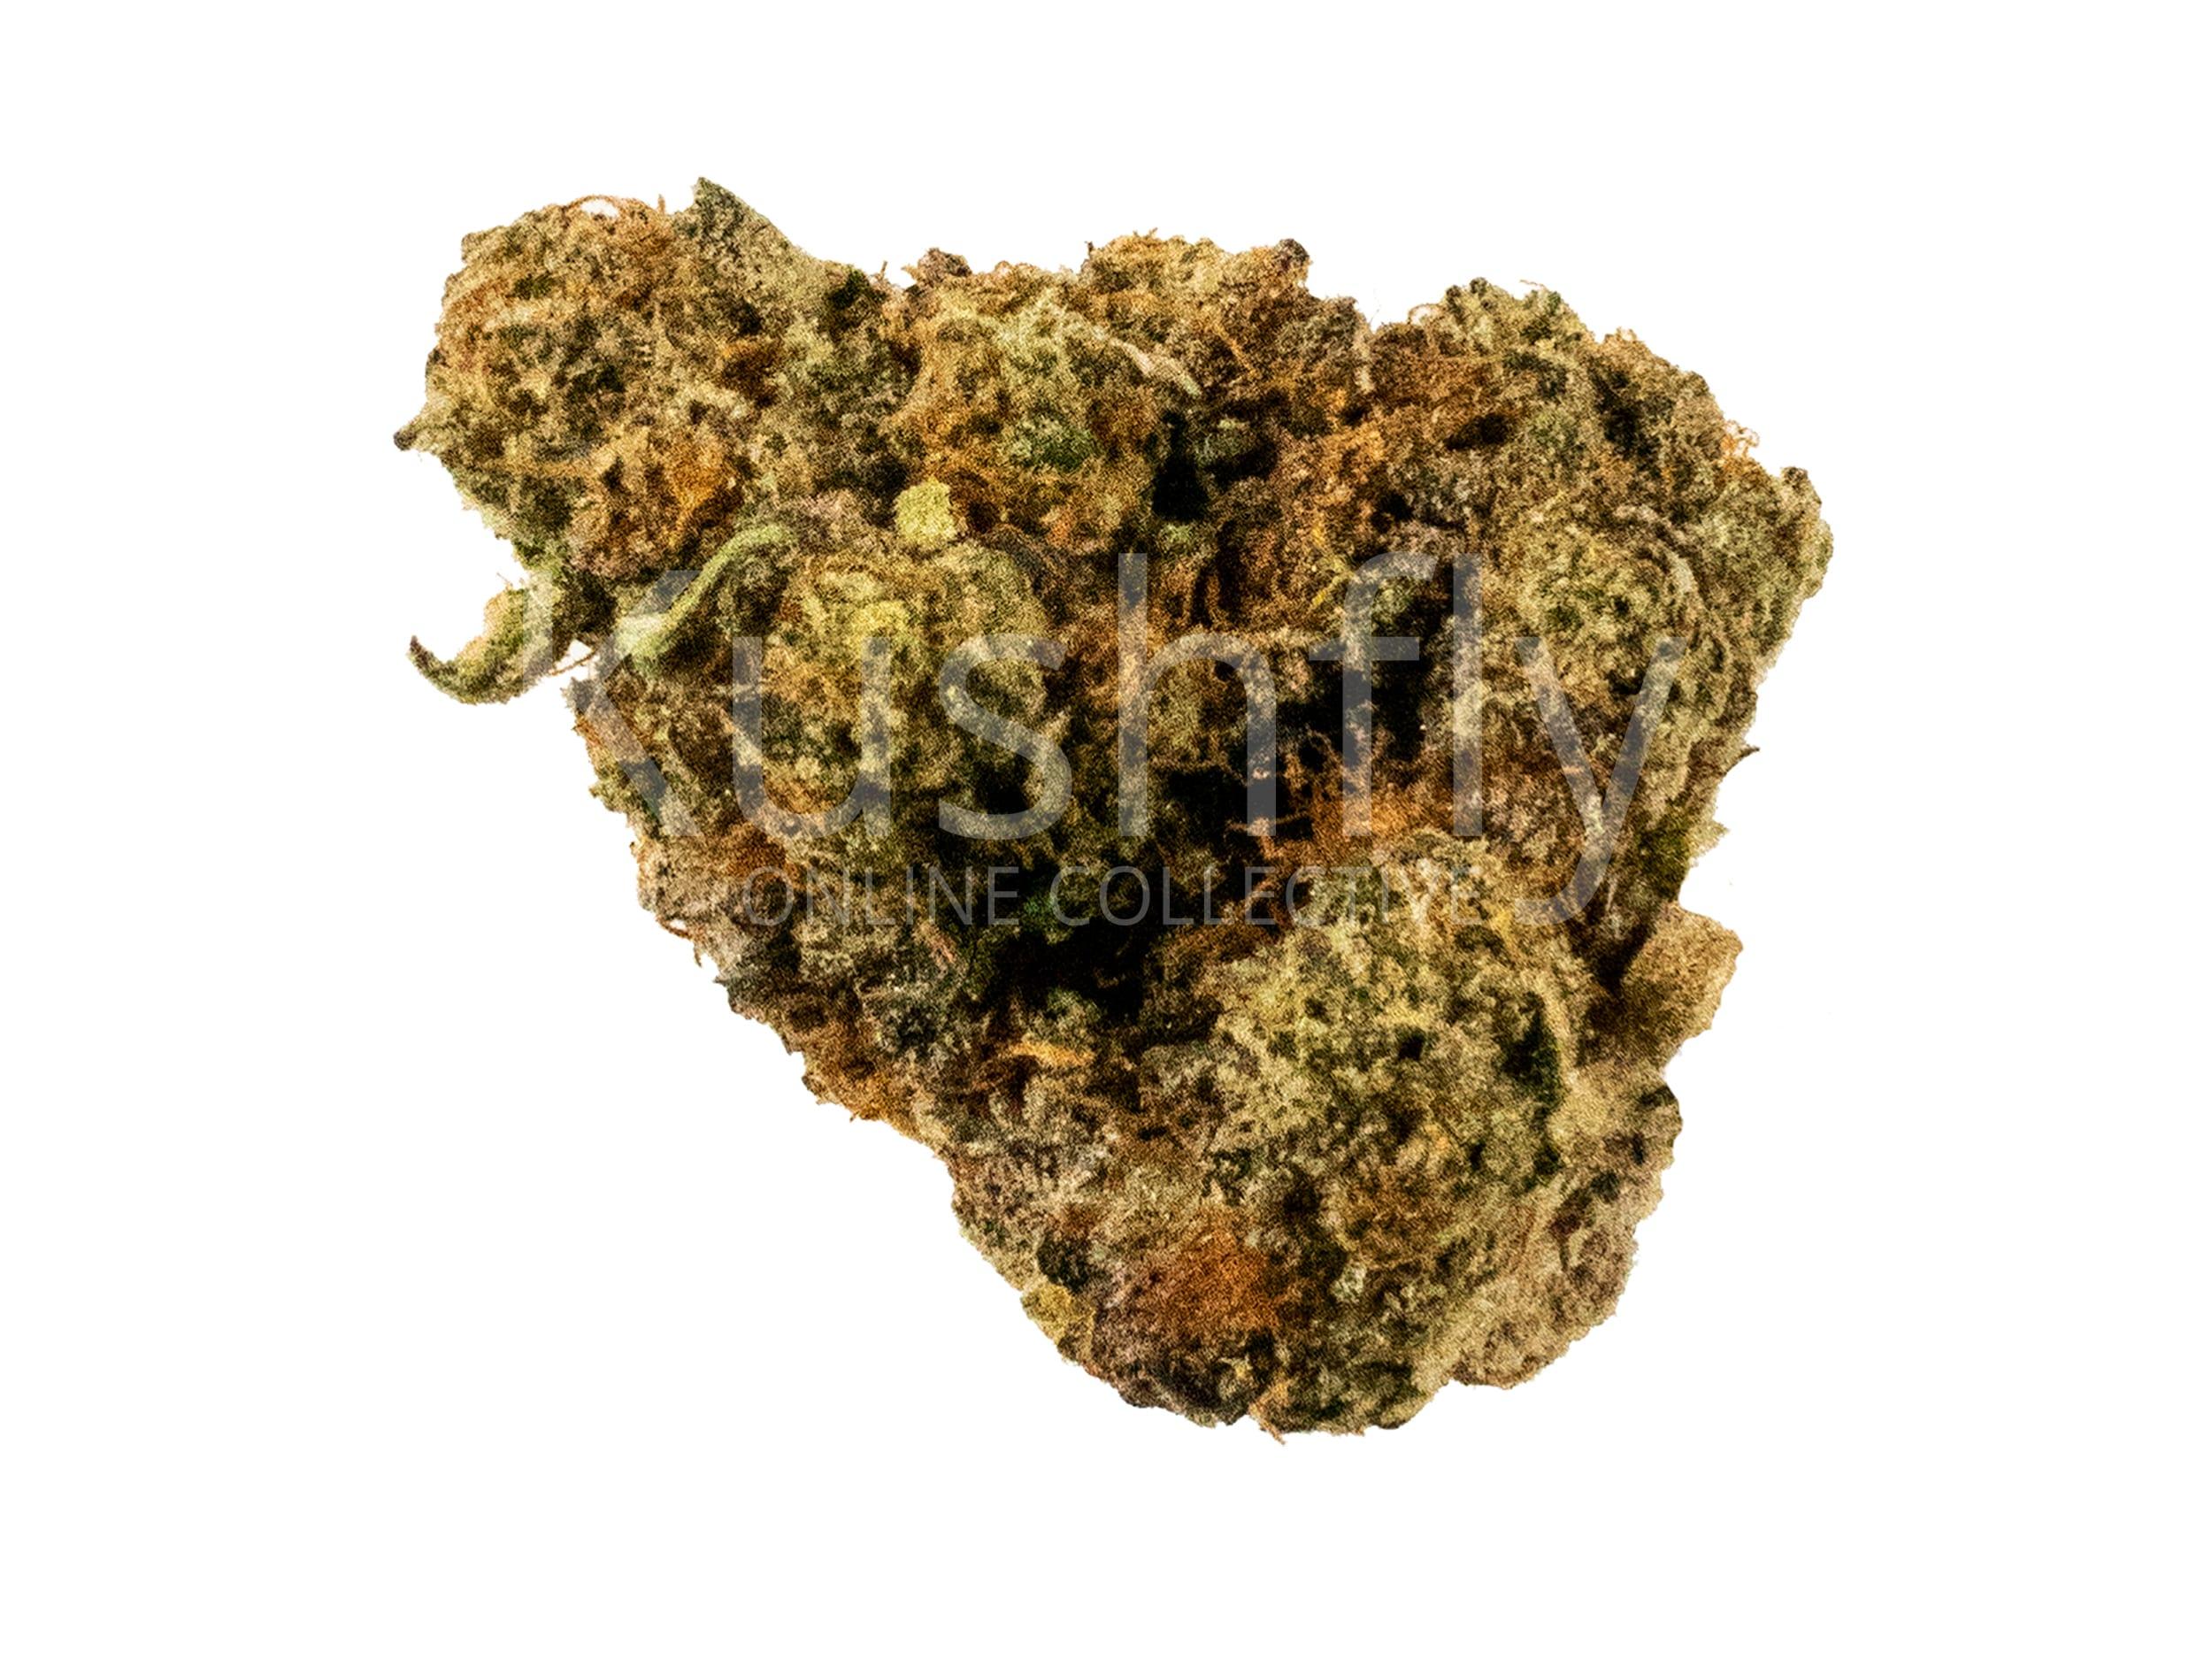 Knbis Wedding Cakecannabis Strain Delivery Anywhere In La Kushfly Com